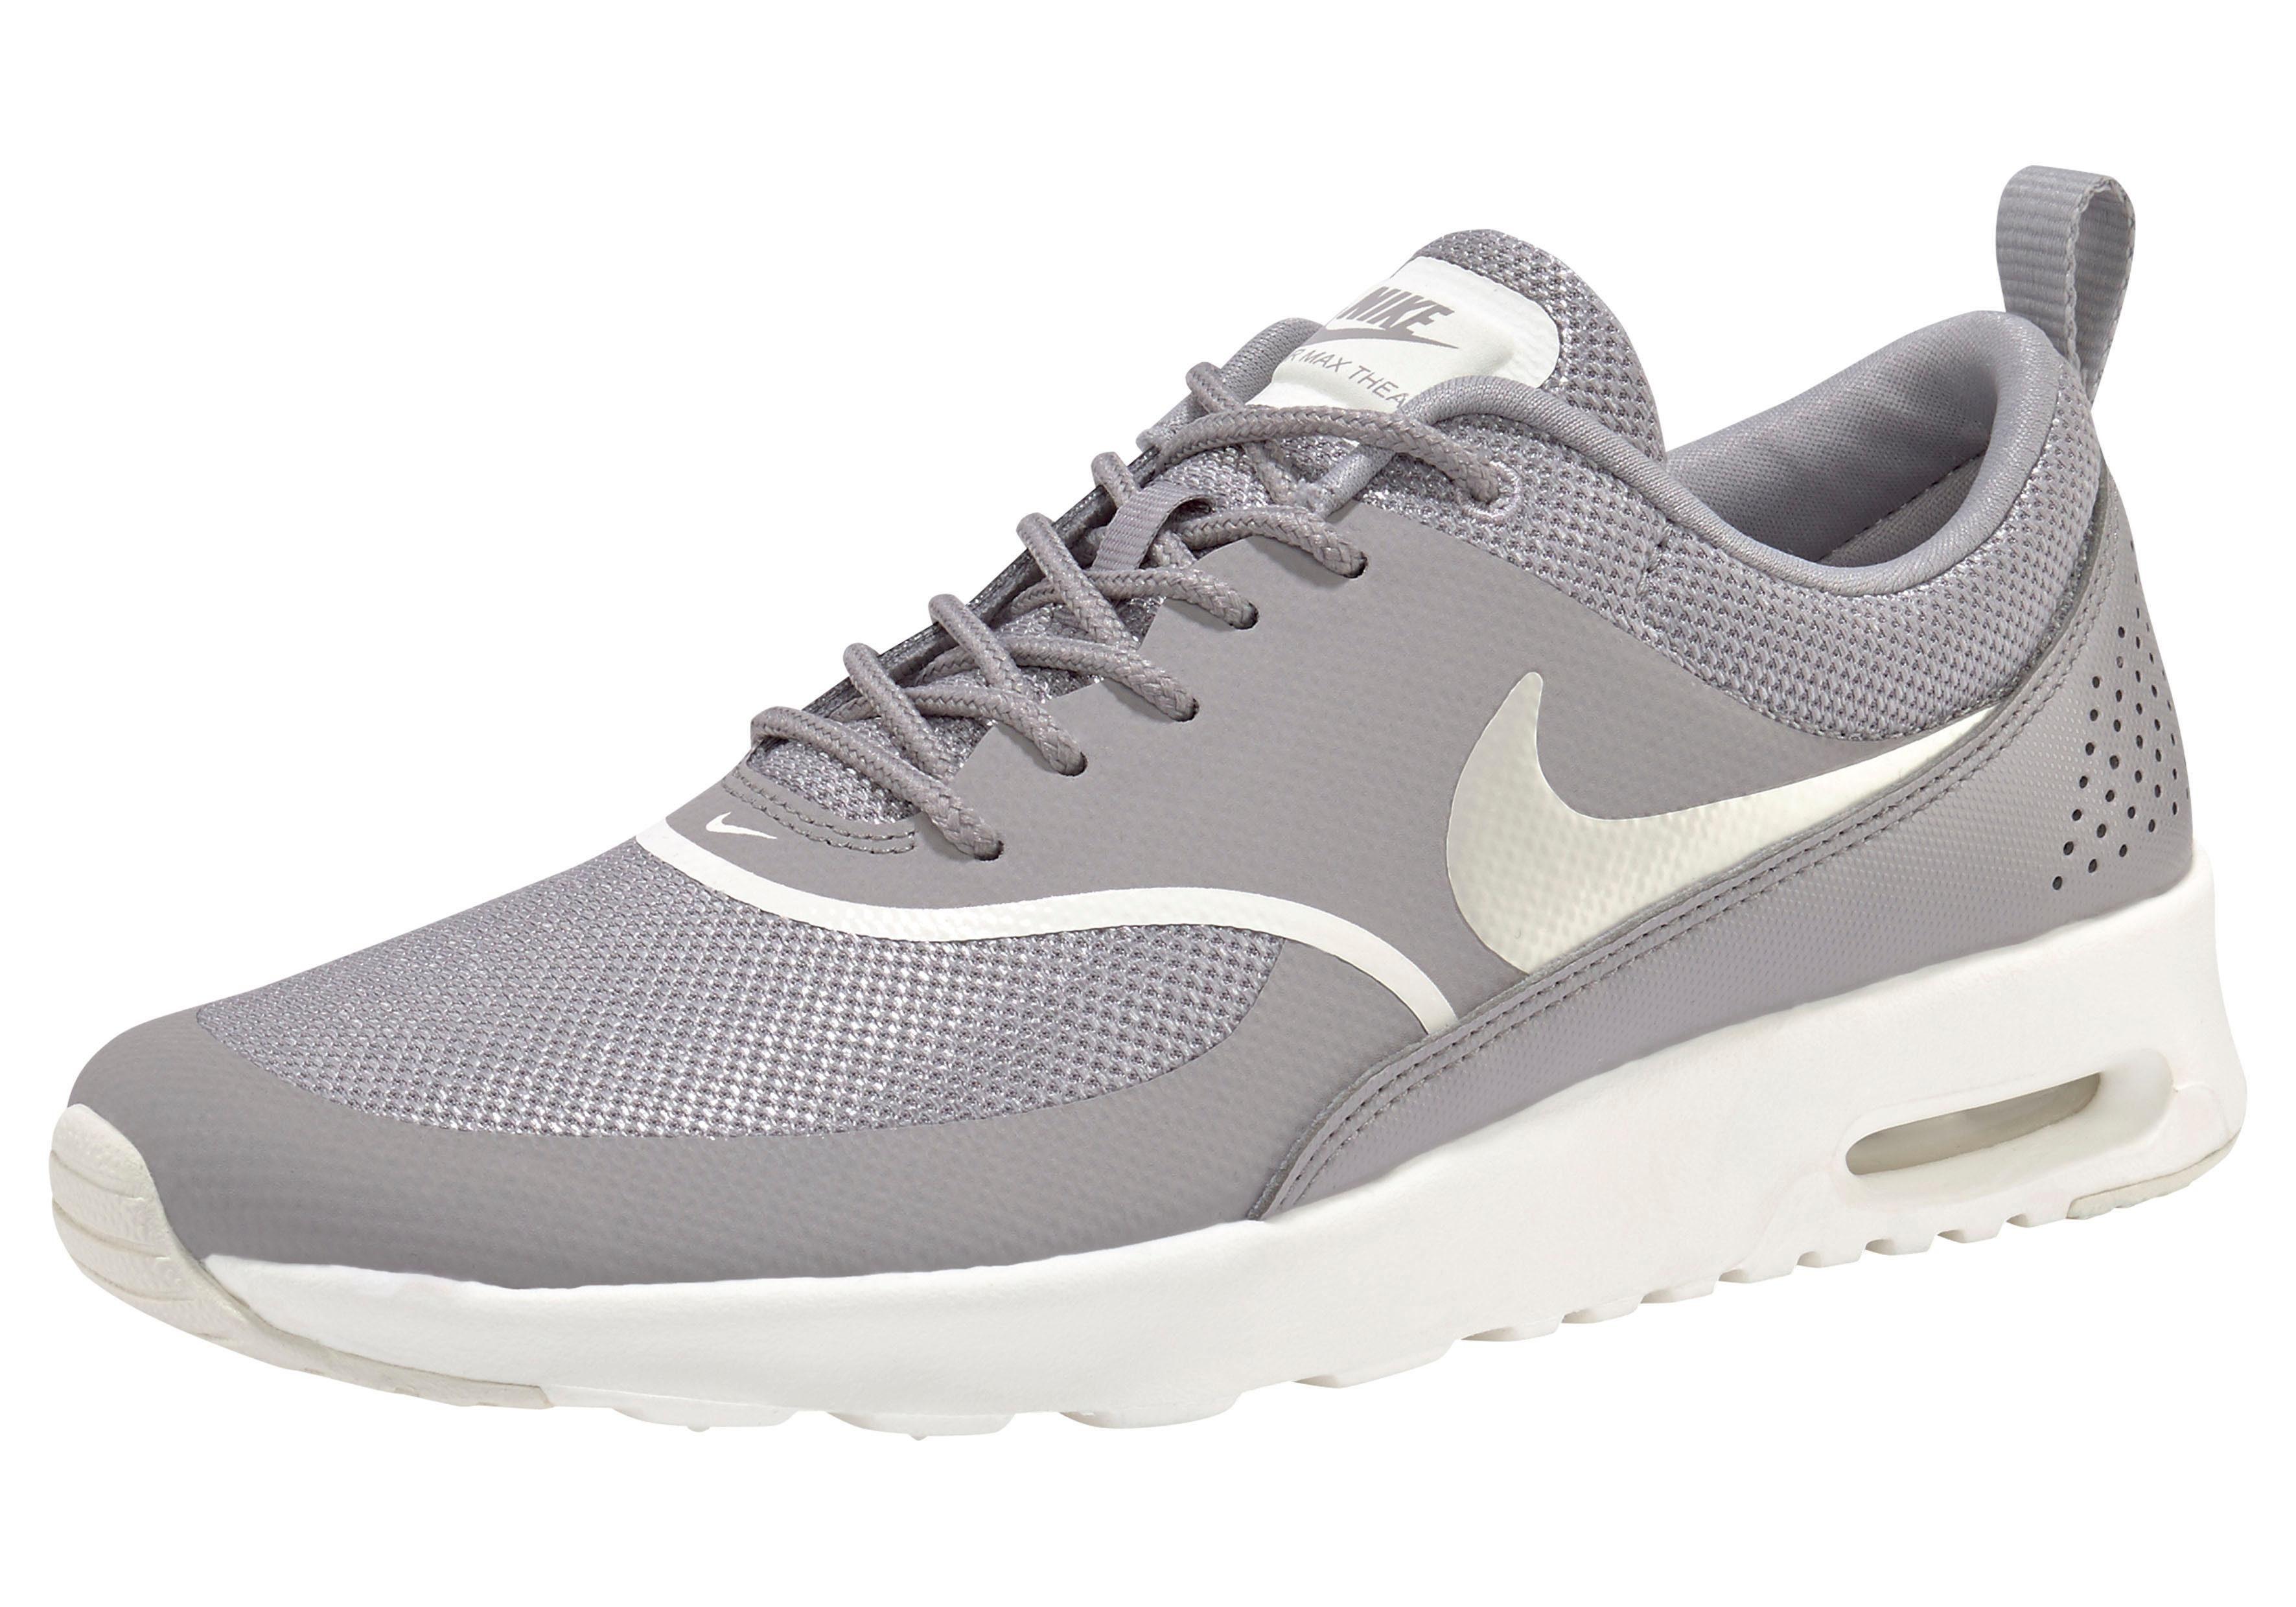 Nike Sportswear »Air Max Thea« Sneaker, Atmungsaktives Obermaterial aus Textil online kaufen | OTTO